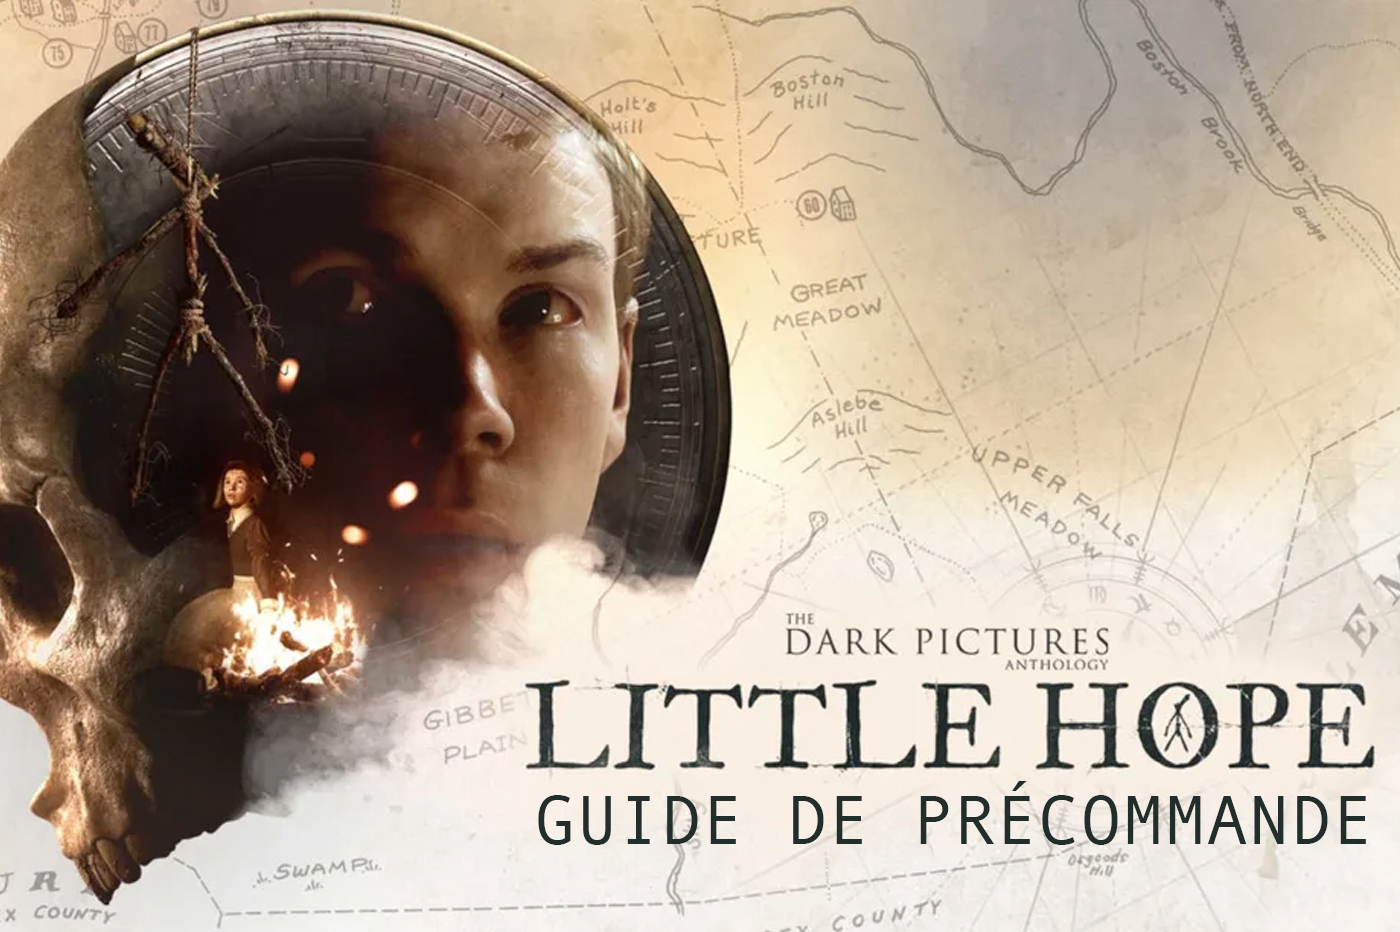 Où précommander The Dark Pictures Anthology: Little Hope?